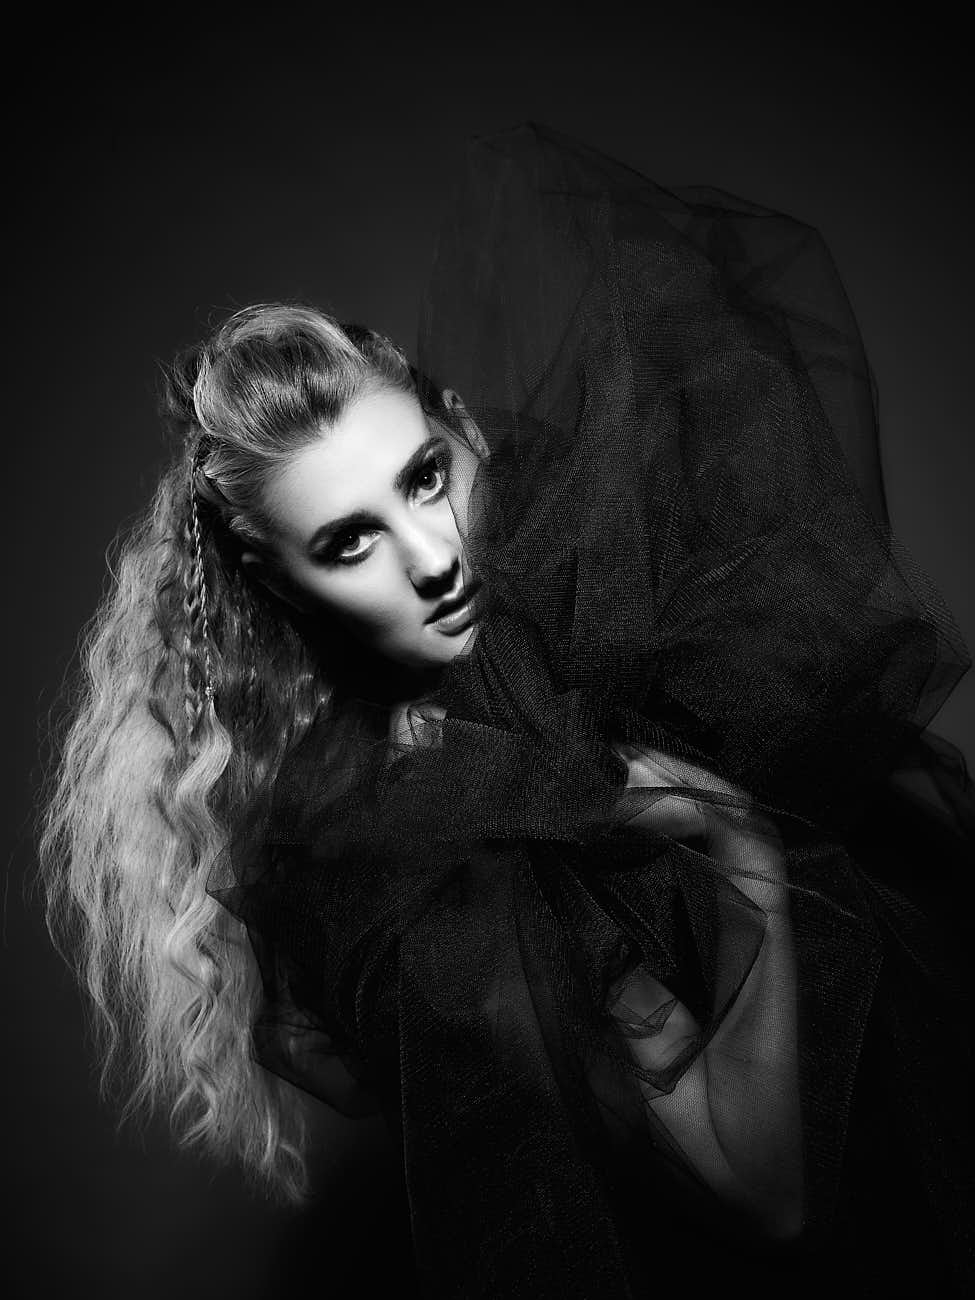 James Pyne Photography-Melbourne-Frankston-Somerville-Mornington Peninsula-Portrait-Headshot-Portfolio-Photographer